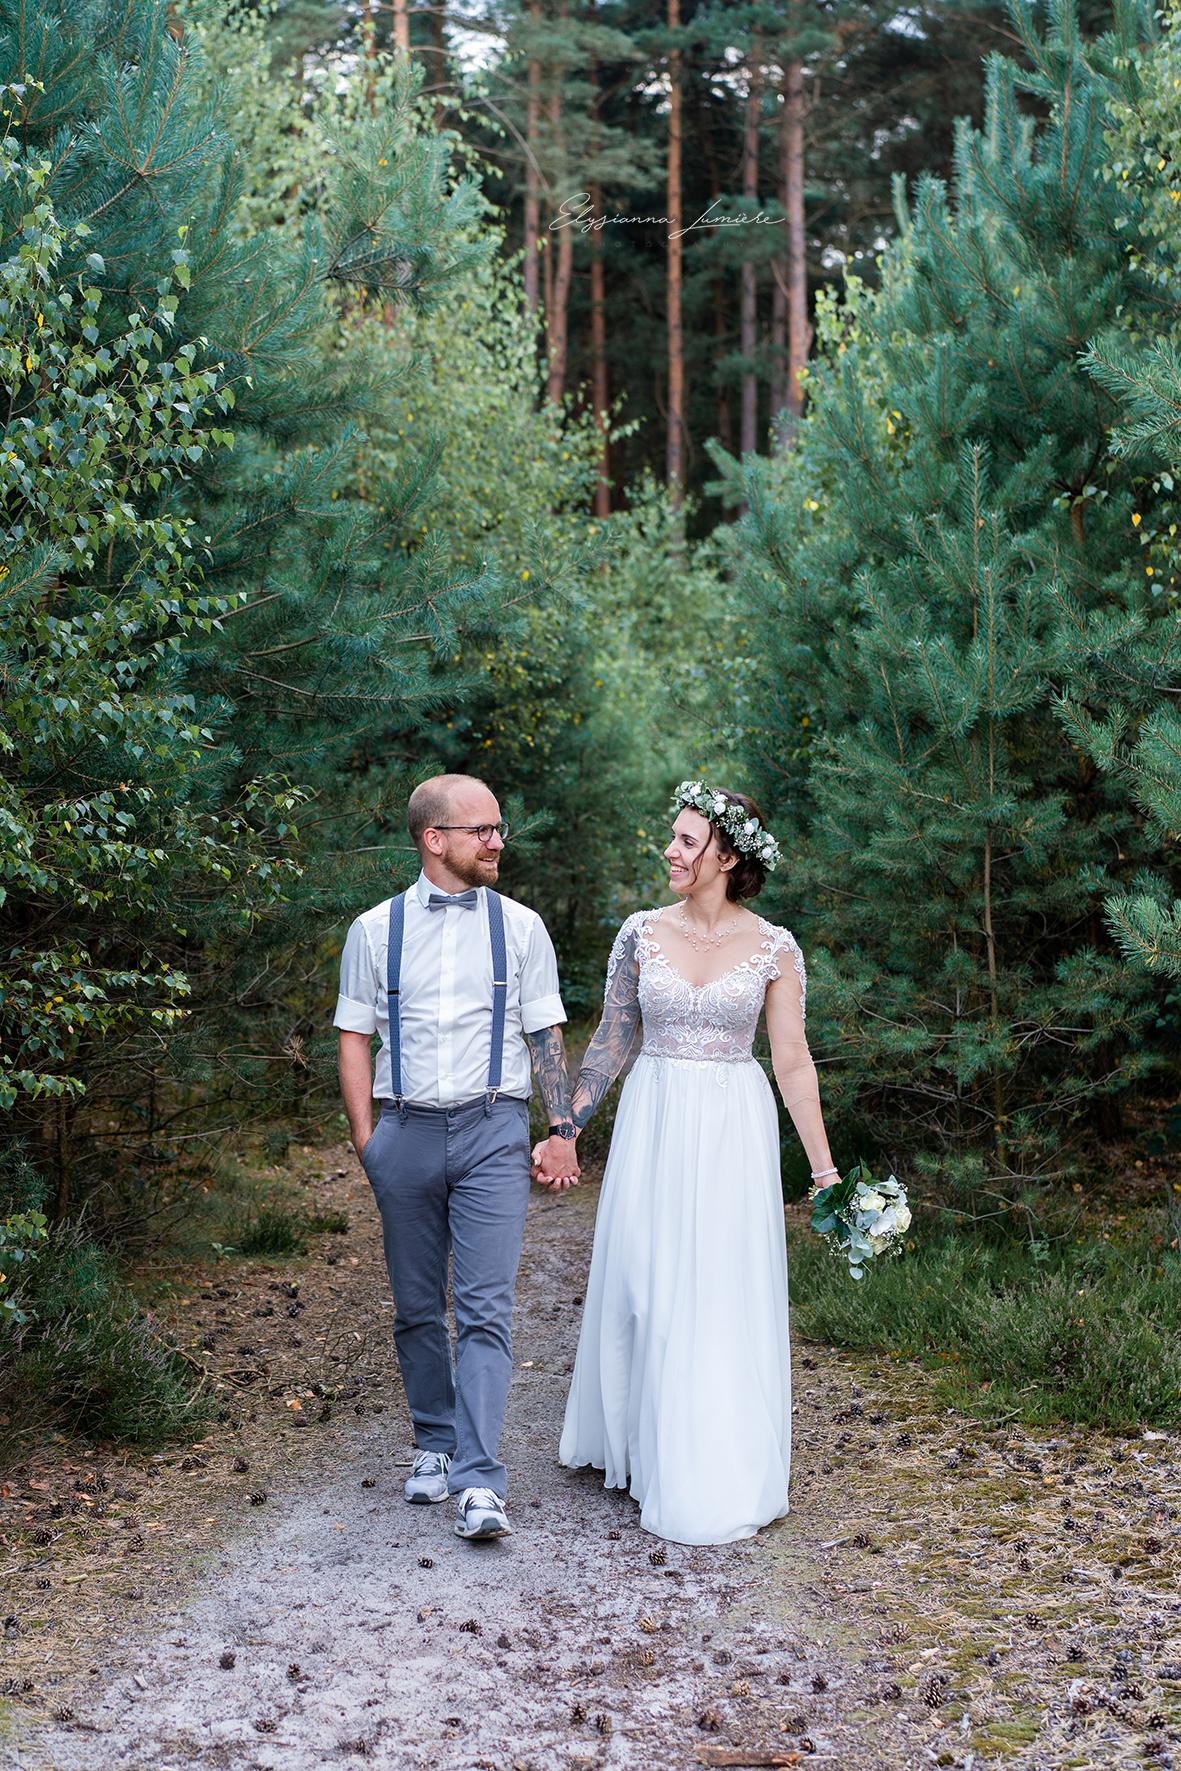 Spaziergang im Wald Brautshooting Weddingphotography Bremen I Elysianna Lumière Photography